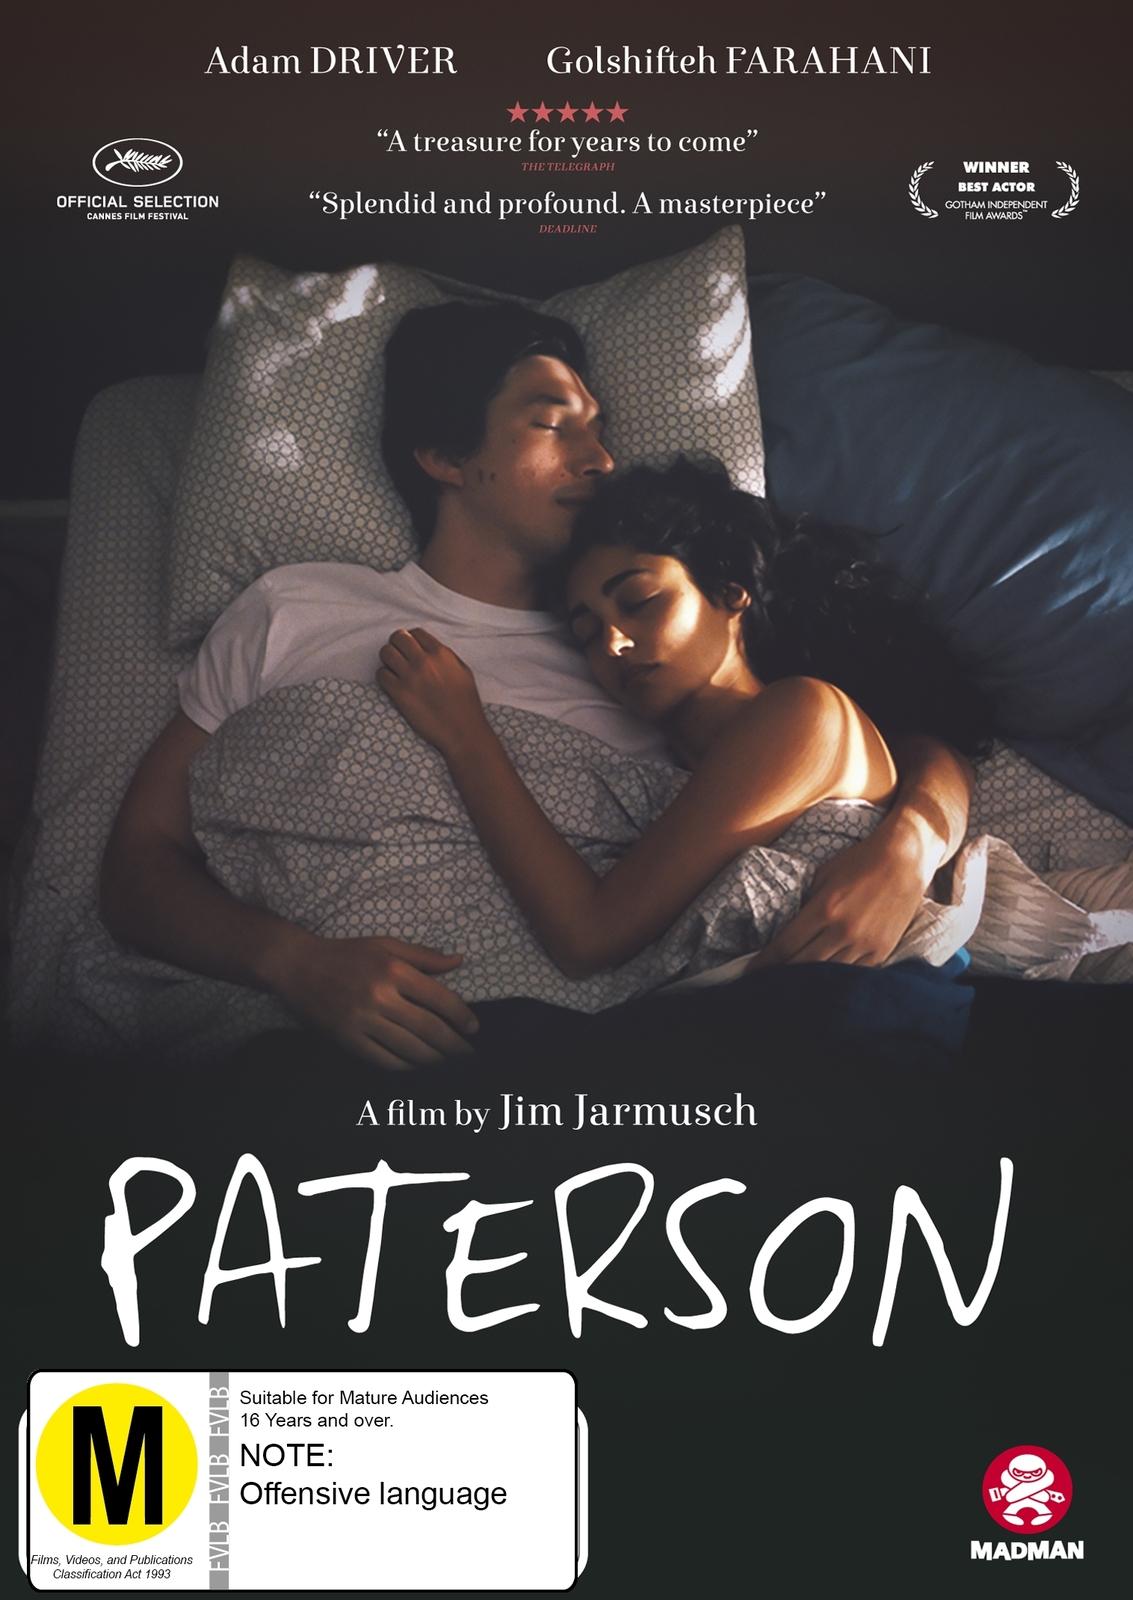 Paterson image